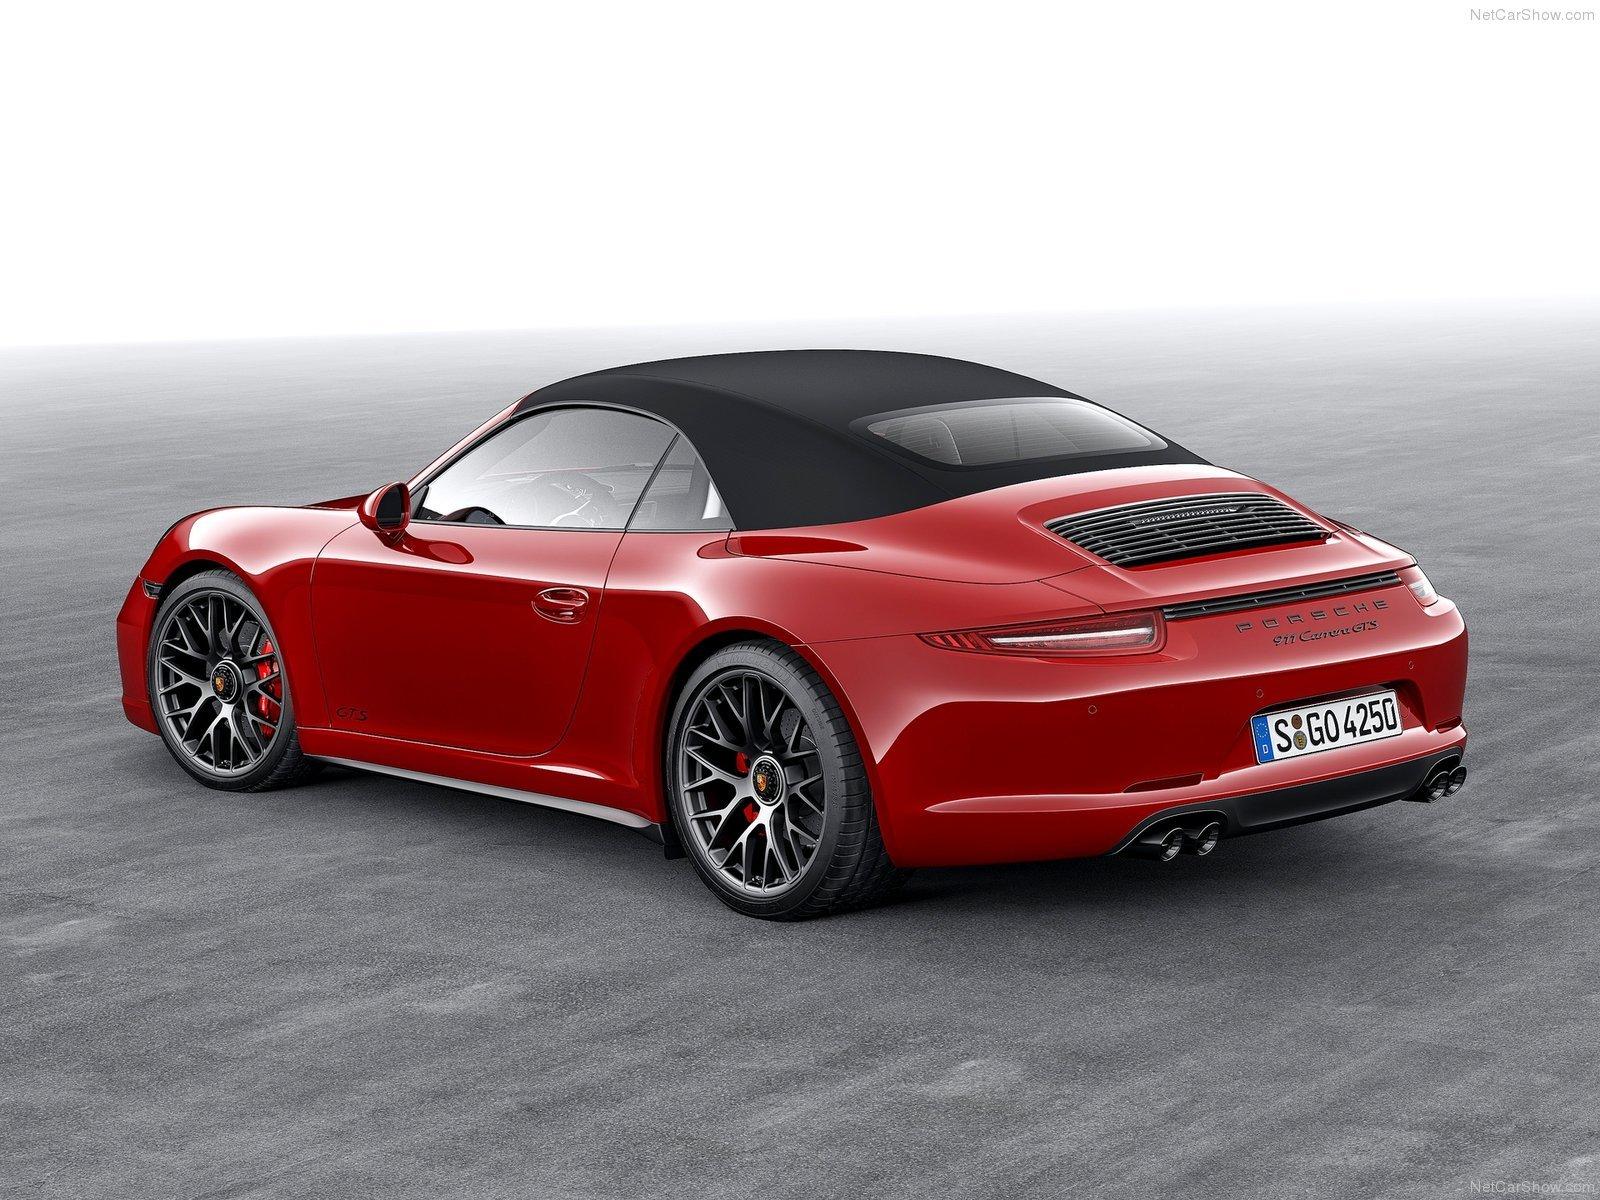 porsche 911 carrera gts 2015 coupe convertible cars 2015 wallpaper 1600x1200 523309. Black Bedroom Furniture Sets. Home Design Ideas